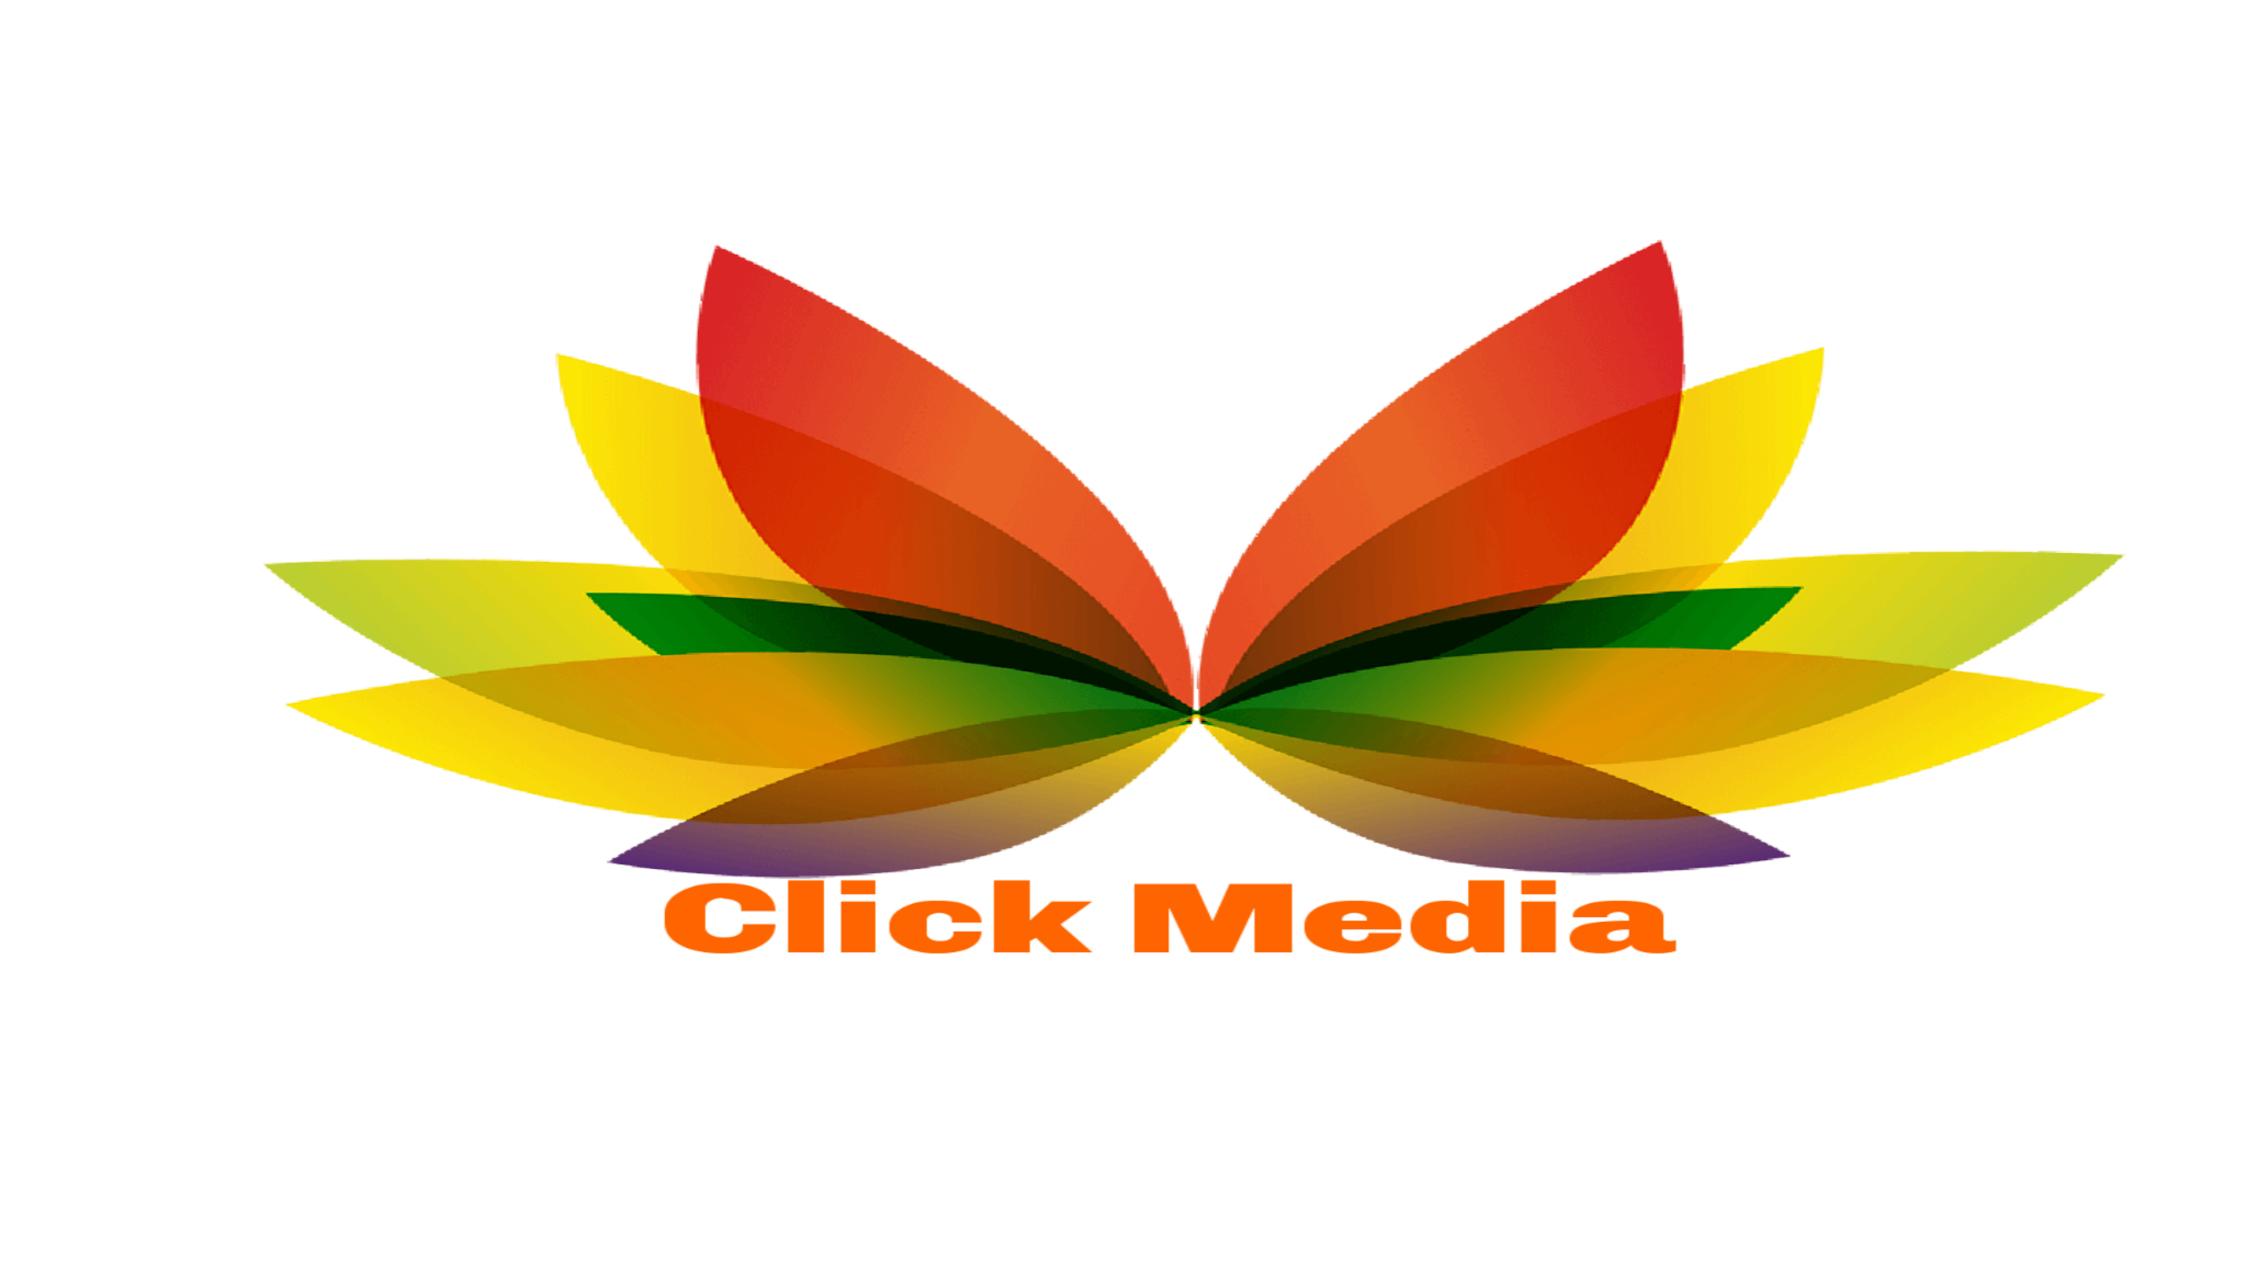 Abdifatah Aba - Click Media Services